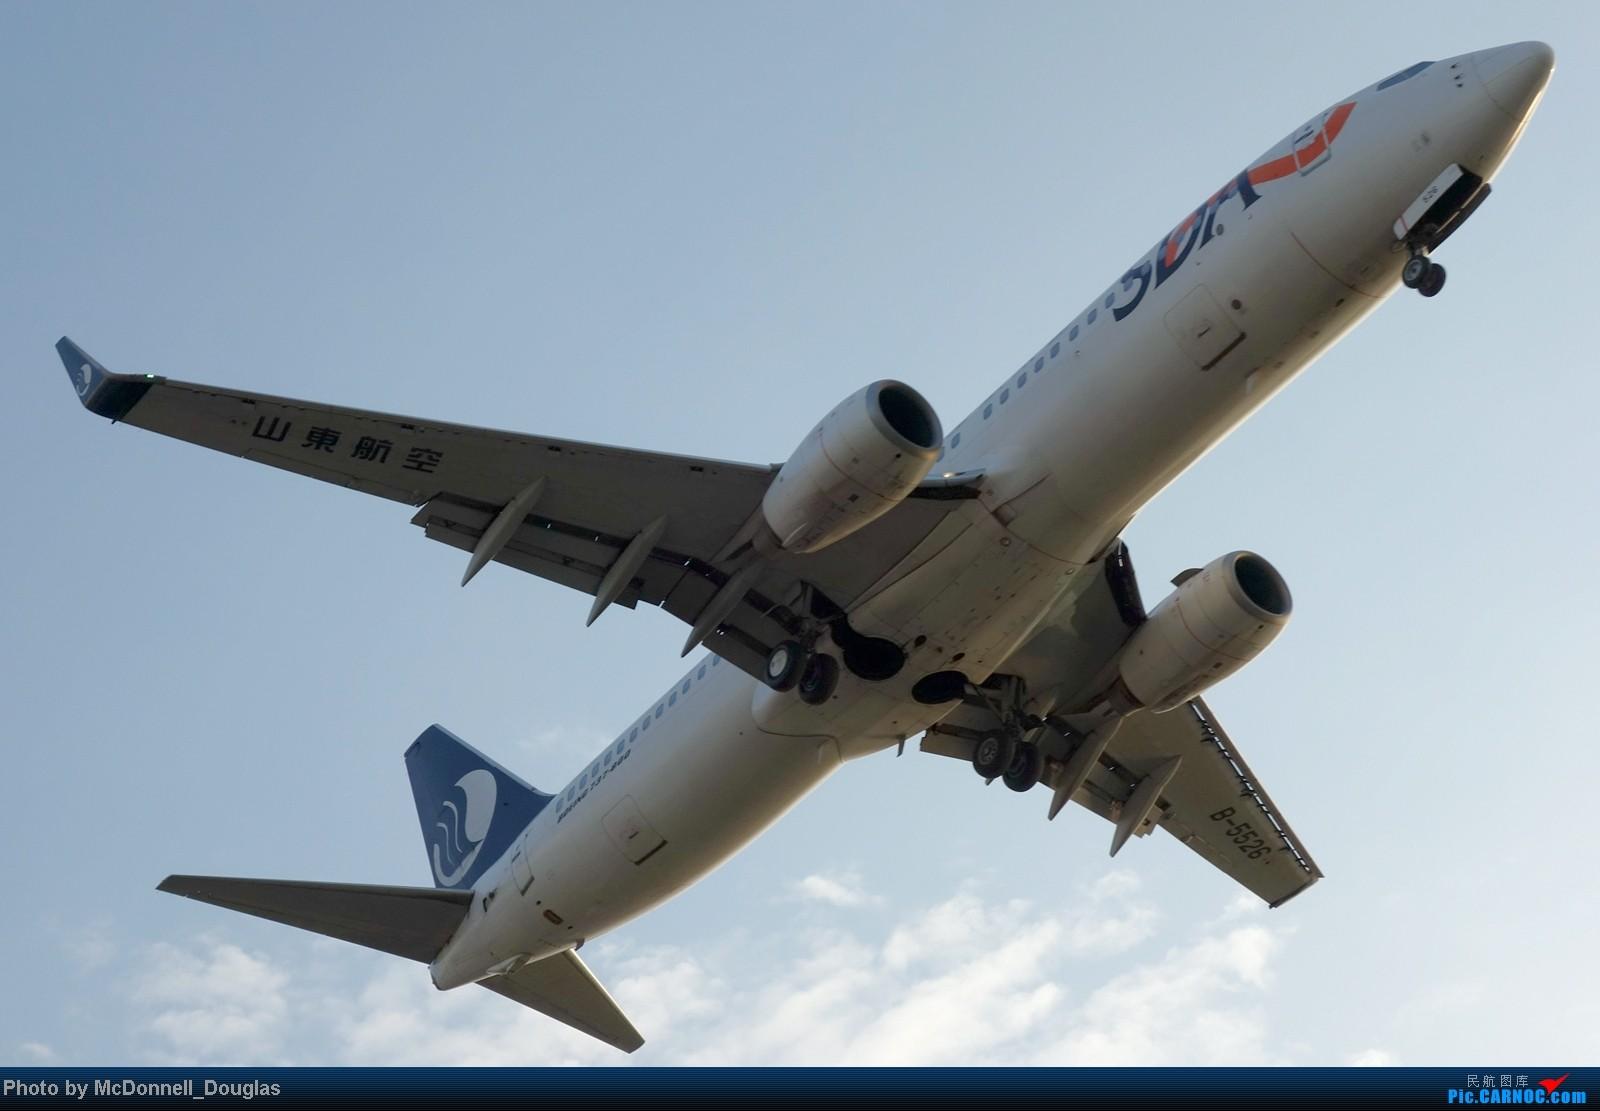 Re:[原创]【上海飞友会】ZSSS杂图一组 BOEING 737-800 B-5526 中国上海虹桥机场